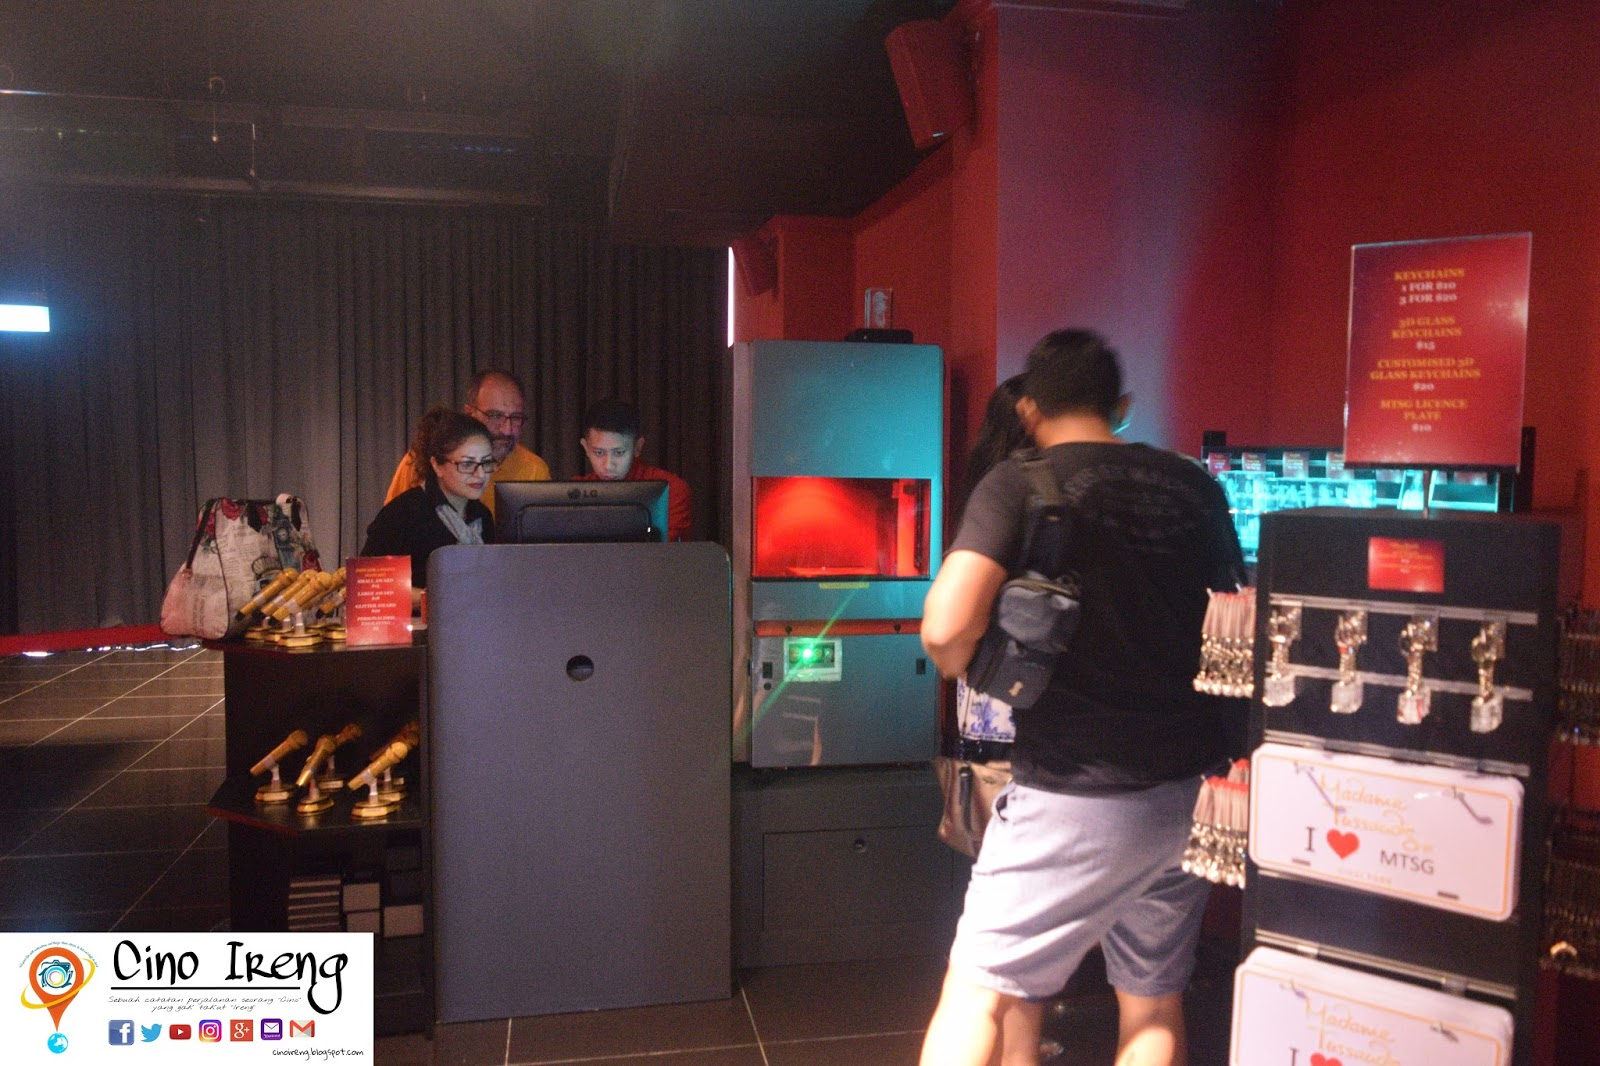 Kenalan Selfie Bareng Tokoh Terkenal Cino Ireng Tiket Madame Tussauds Singapore Akhirnya Bisa Menghirup Udara Segar Saat Istirahat Dan Waktu Liat Jam Jujur Gue Sendiri Kaget Soalnya Sekitar 3 Kita Keliling